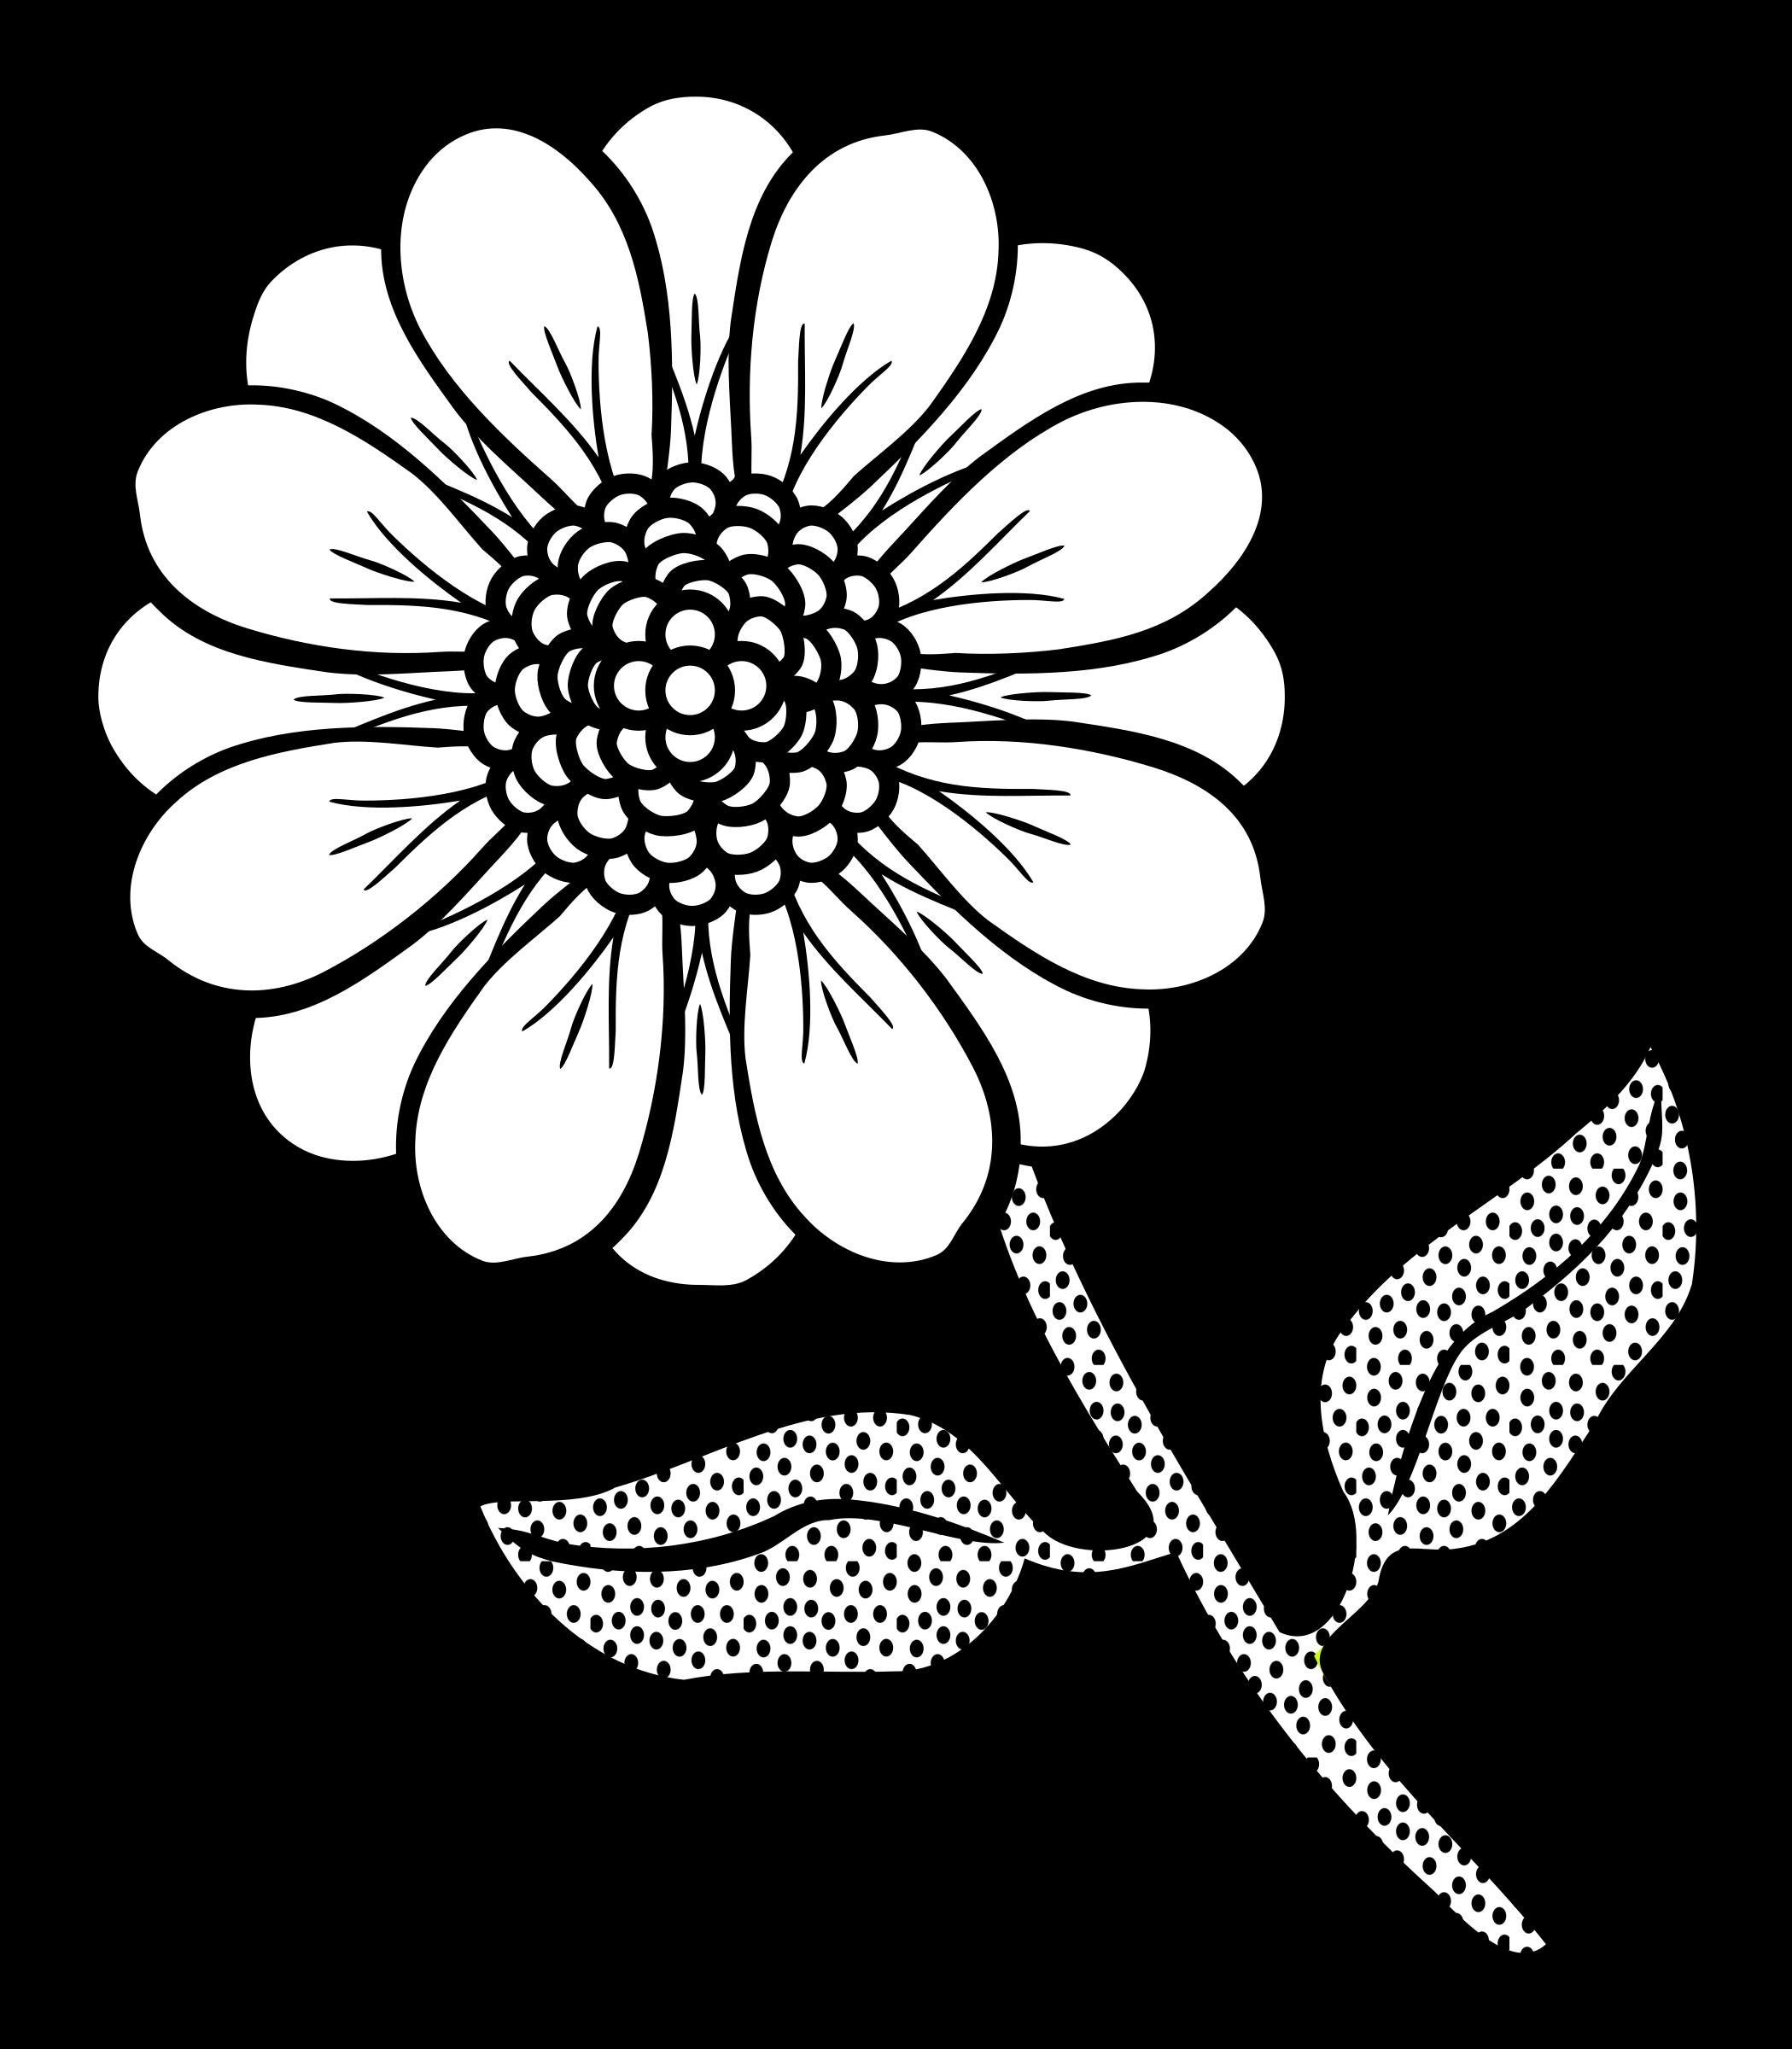 Clipart lineart big image. Flower line art png